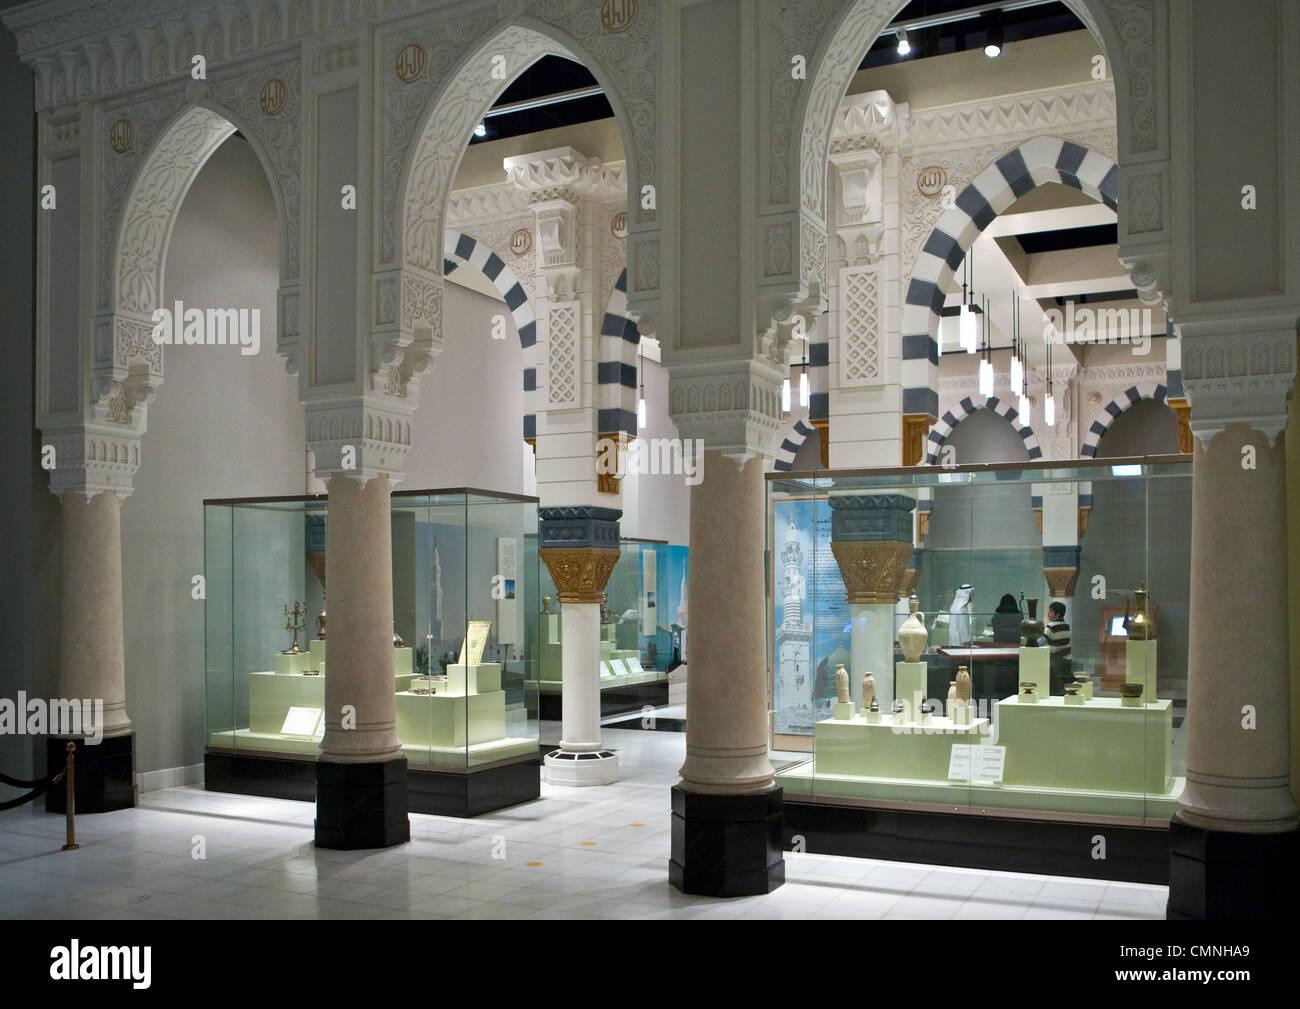 Asia Saudi Arabia  Riyadh The National museum - Stock Image